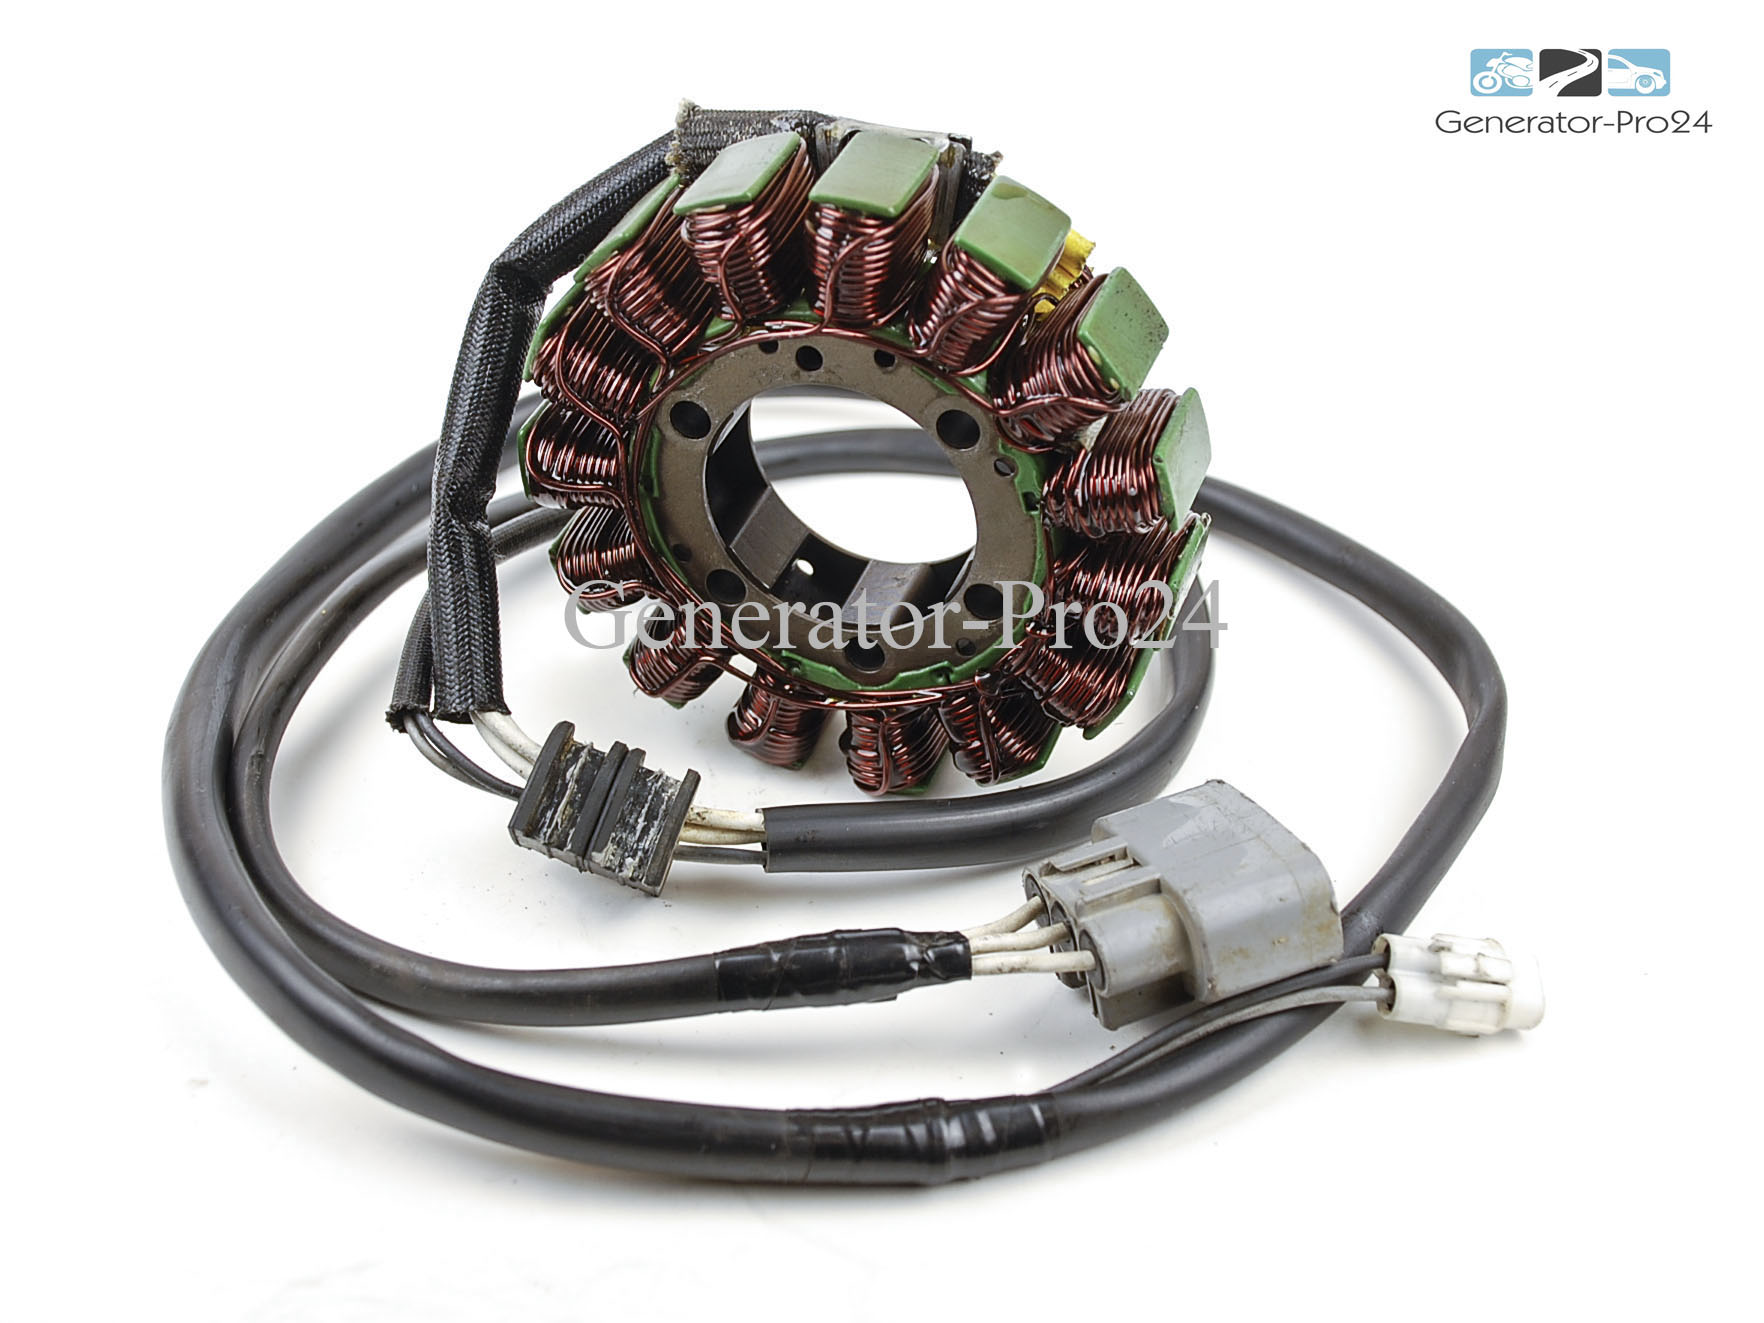 YAMAHA Stator Ass'y, OEM# 28P-81410-01-00   Generator-Pro24